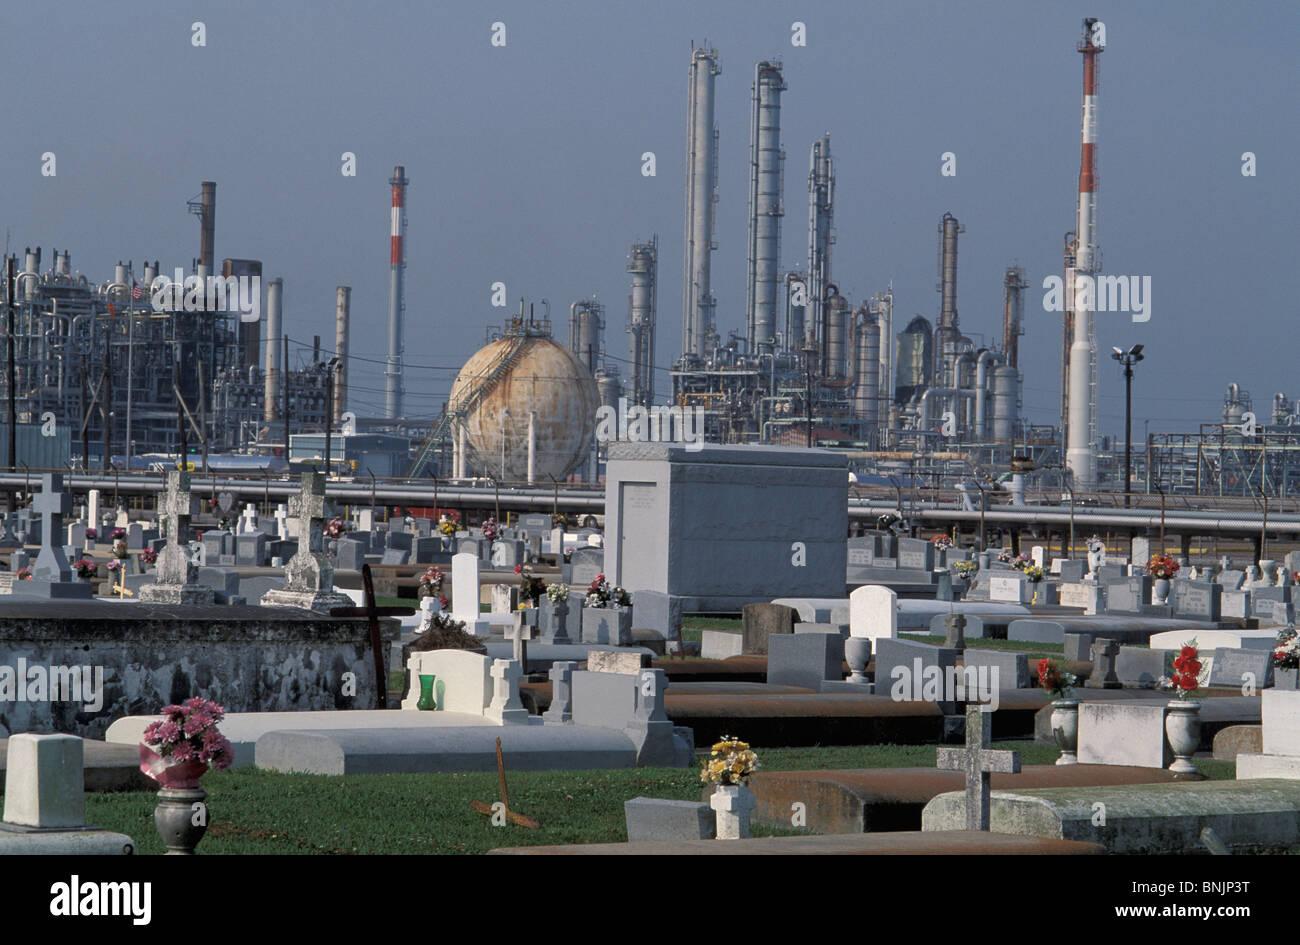 Petrochemical Plant Hahnville Louisiana USA North America America